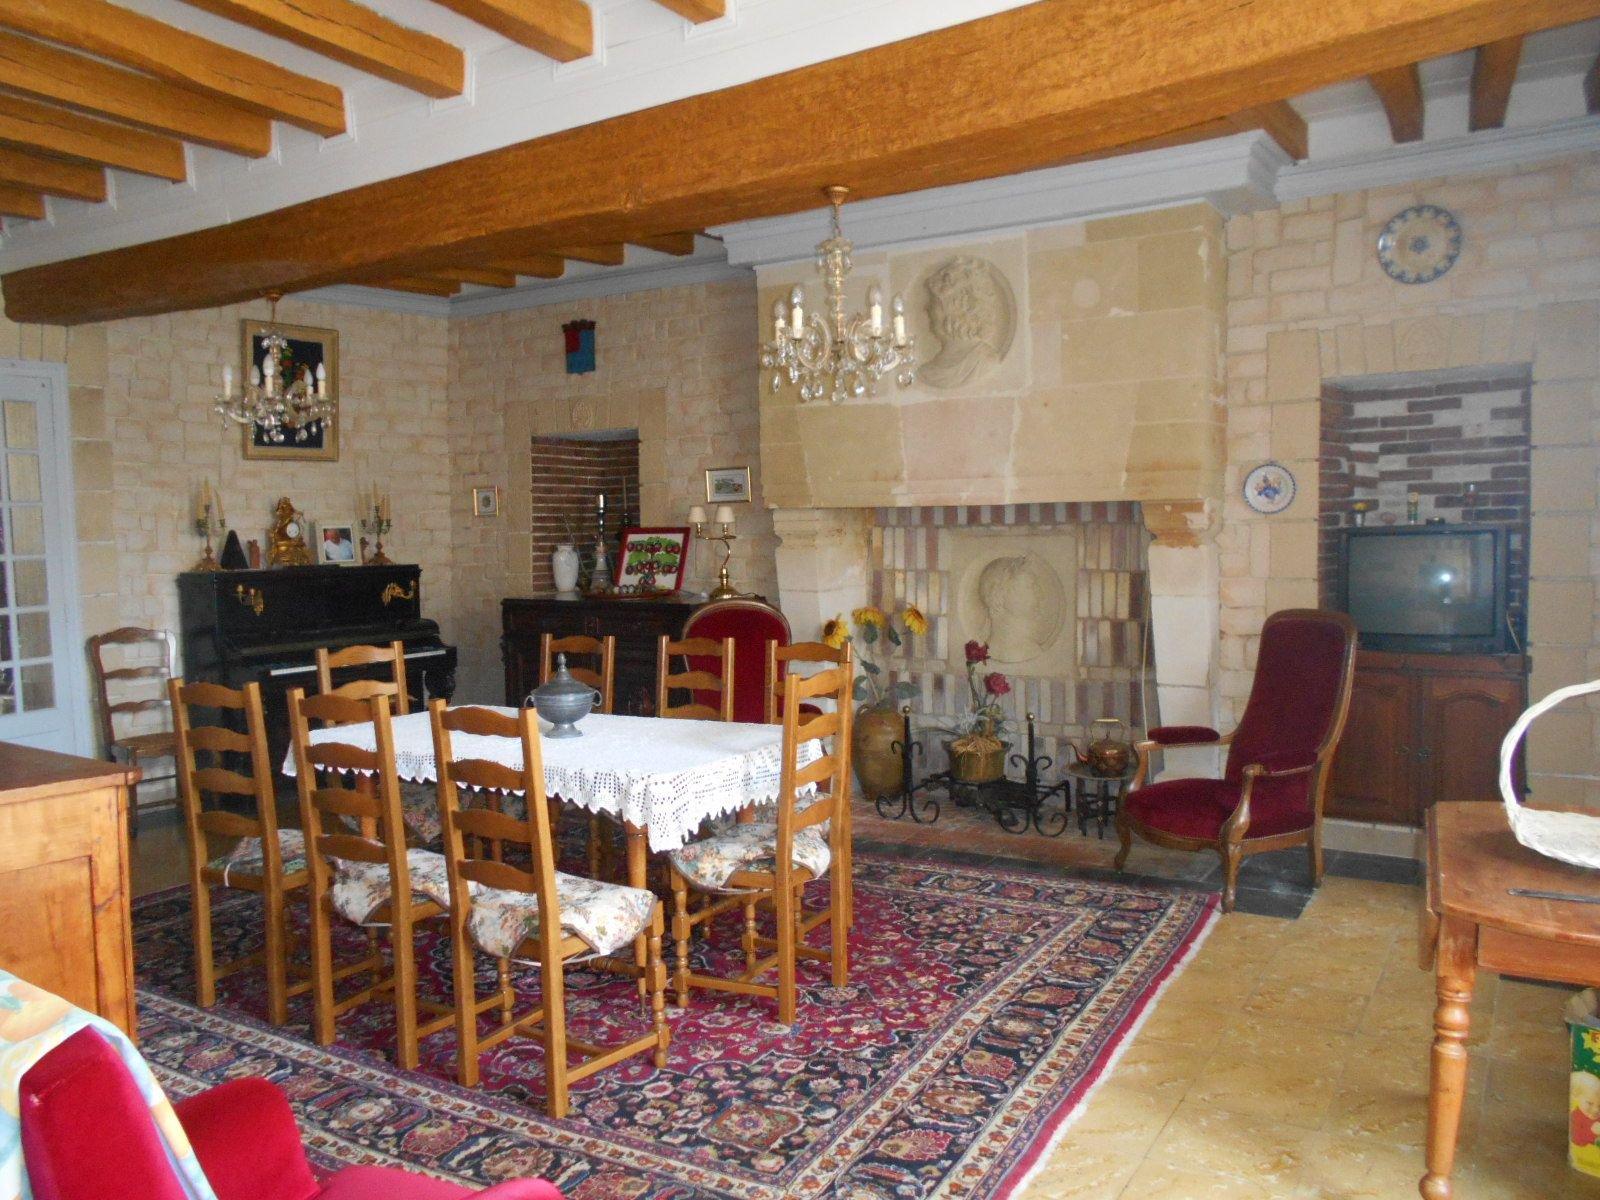 Ravissante demeure au coeur de Thouars